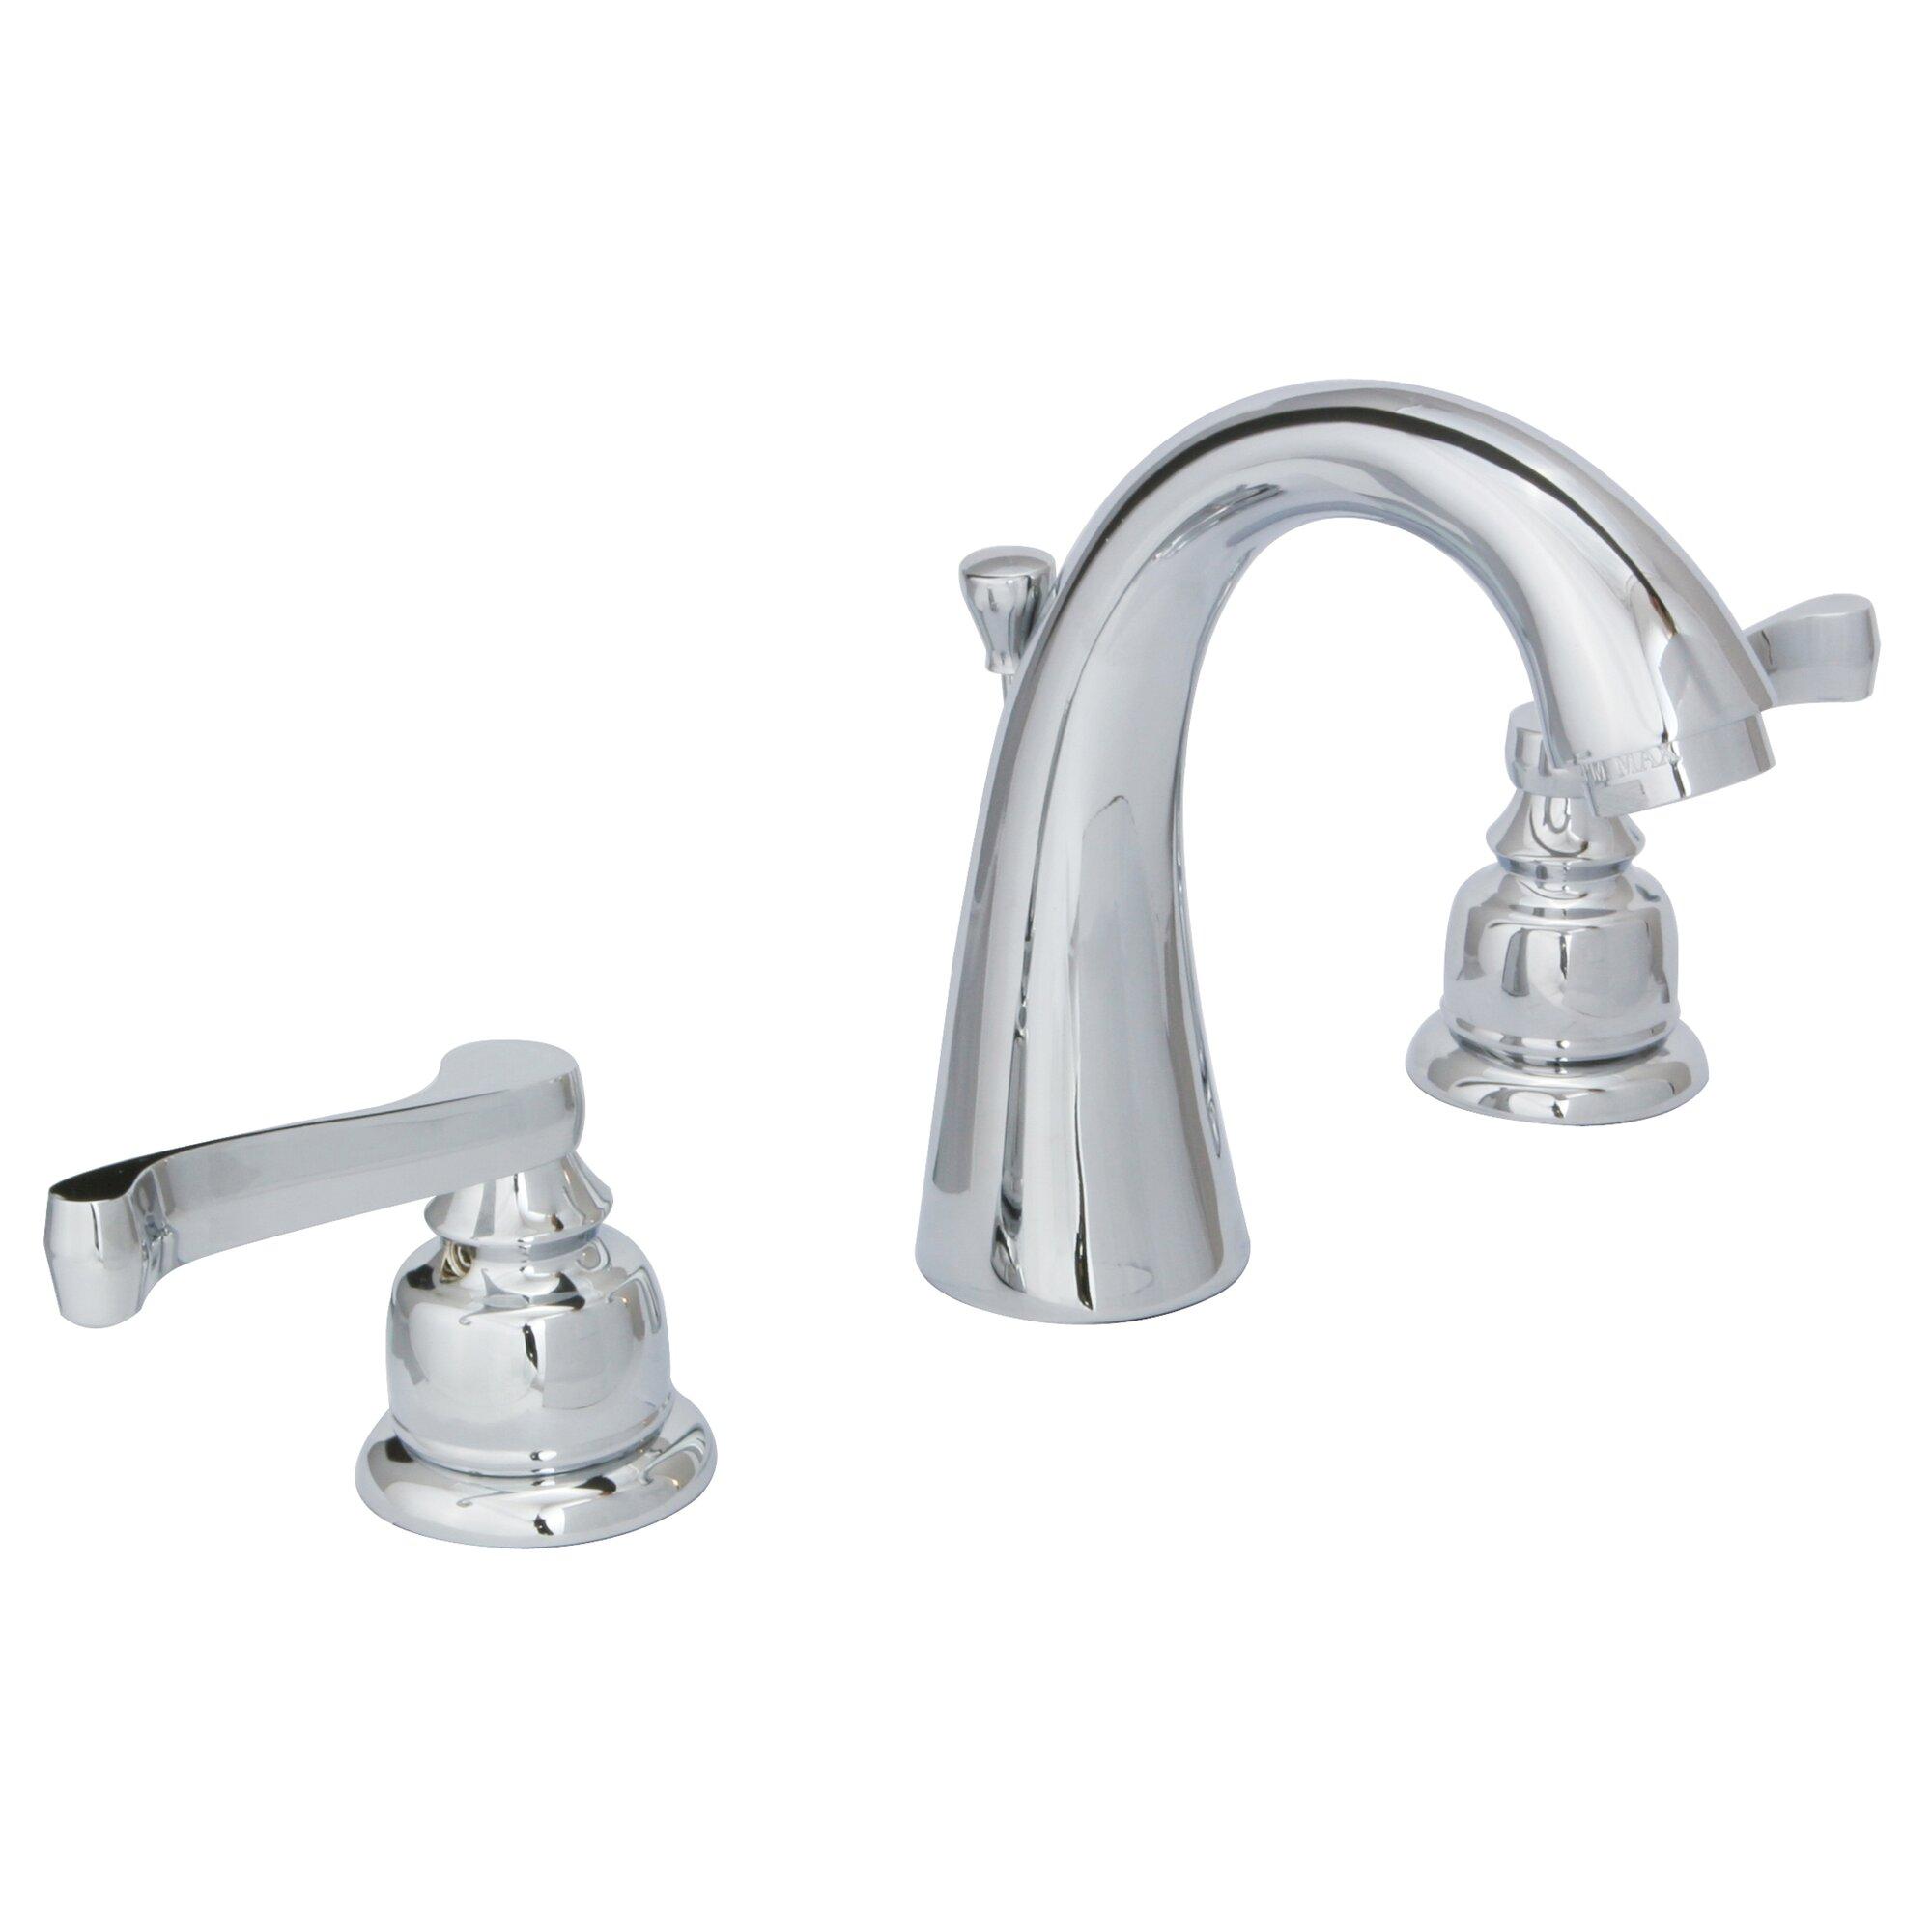 Cross Handle Bathroom Faucet Huntingtonbrass Sienna Widespread Lever Handle Bathroom Faucet